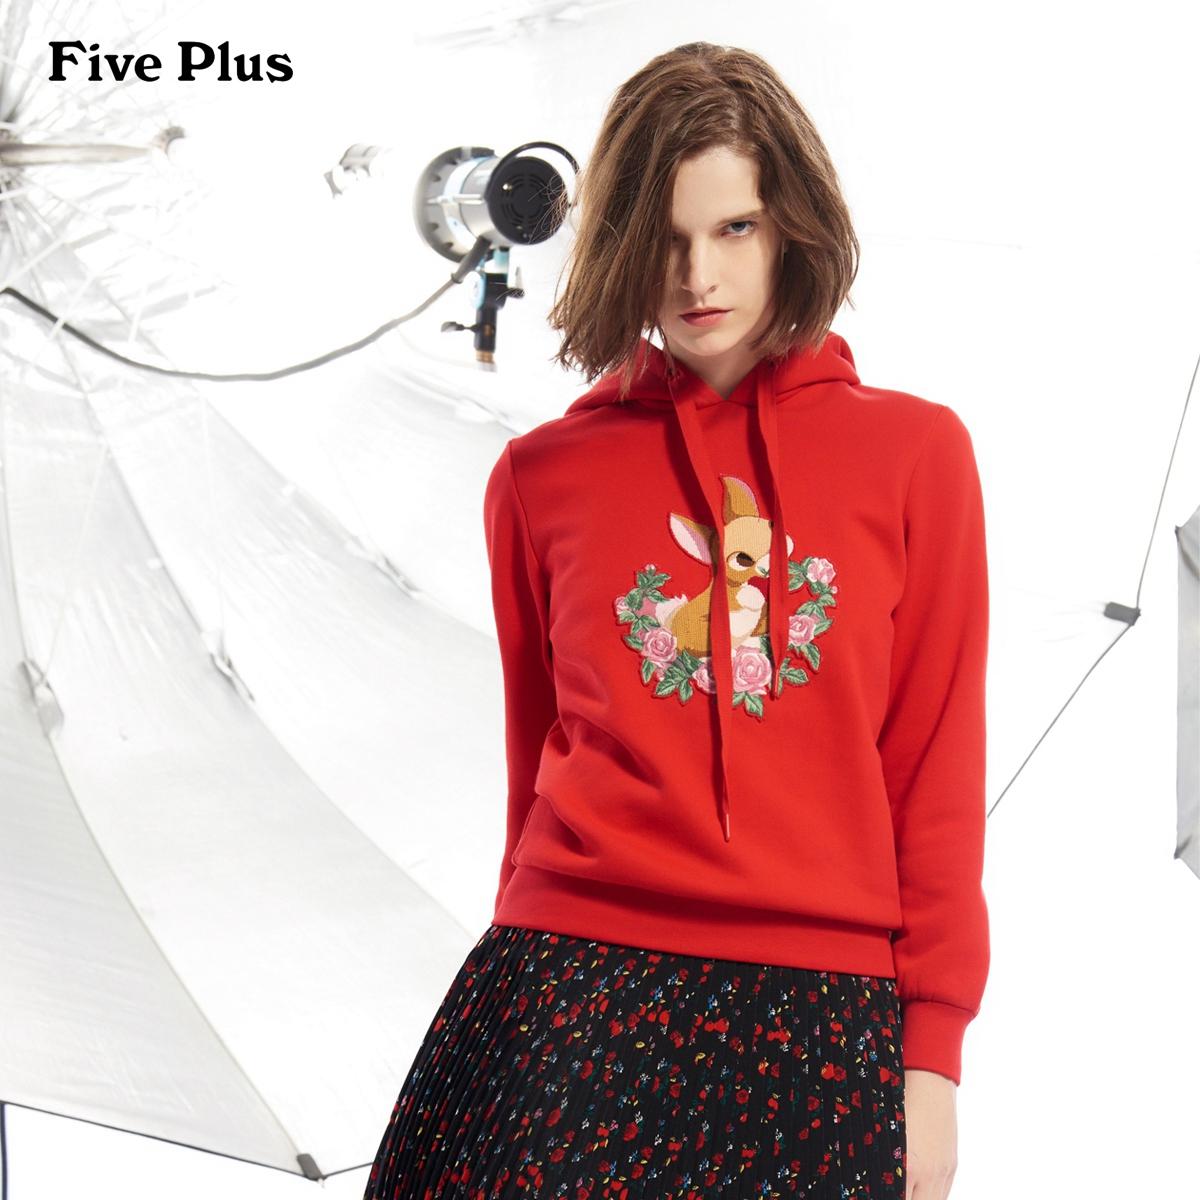 Five Plus女冬装卫衣式T恤女宽松刺绣连帽套头衫长袖图案棉质